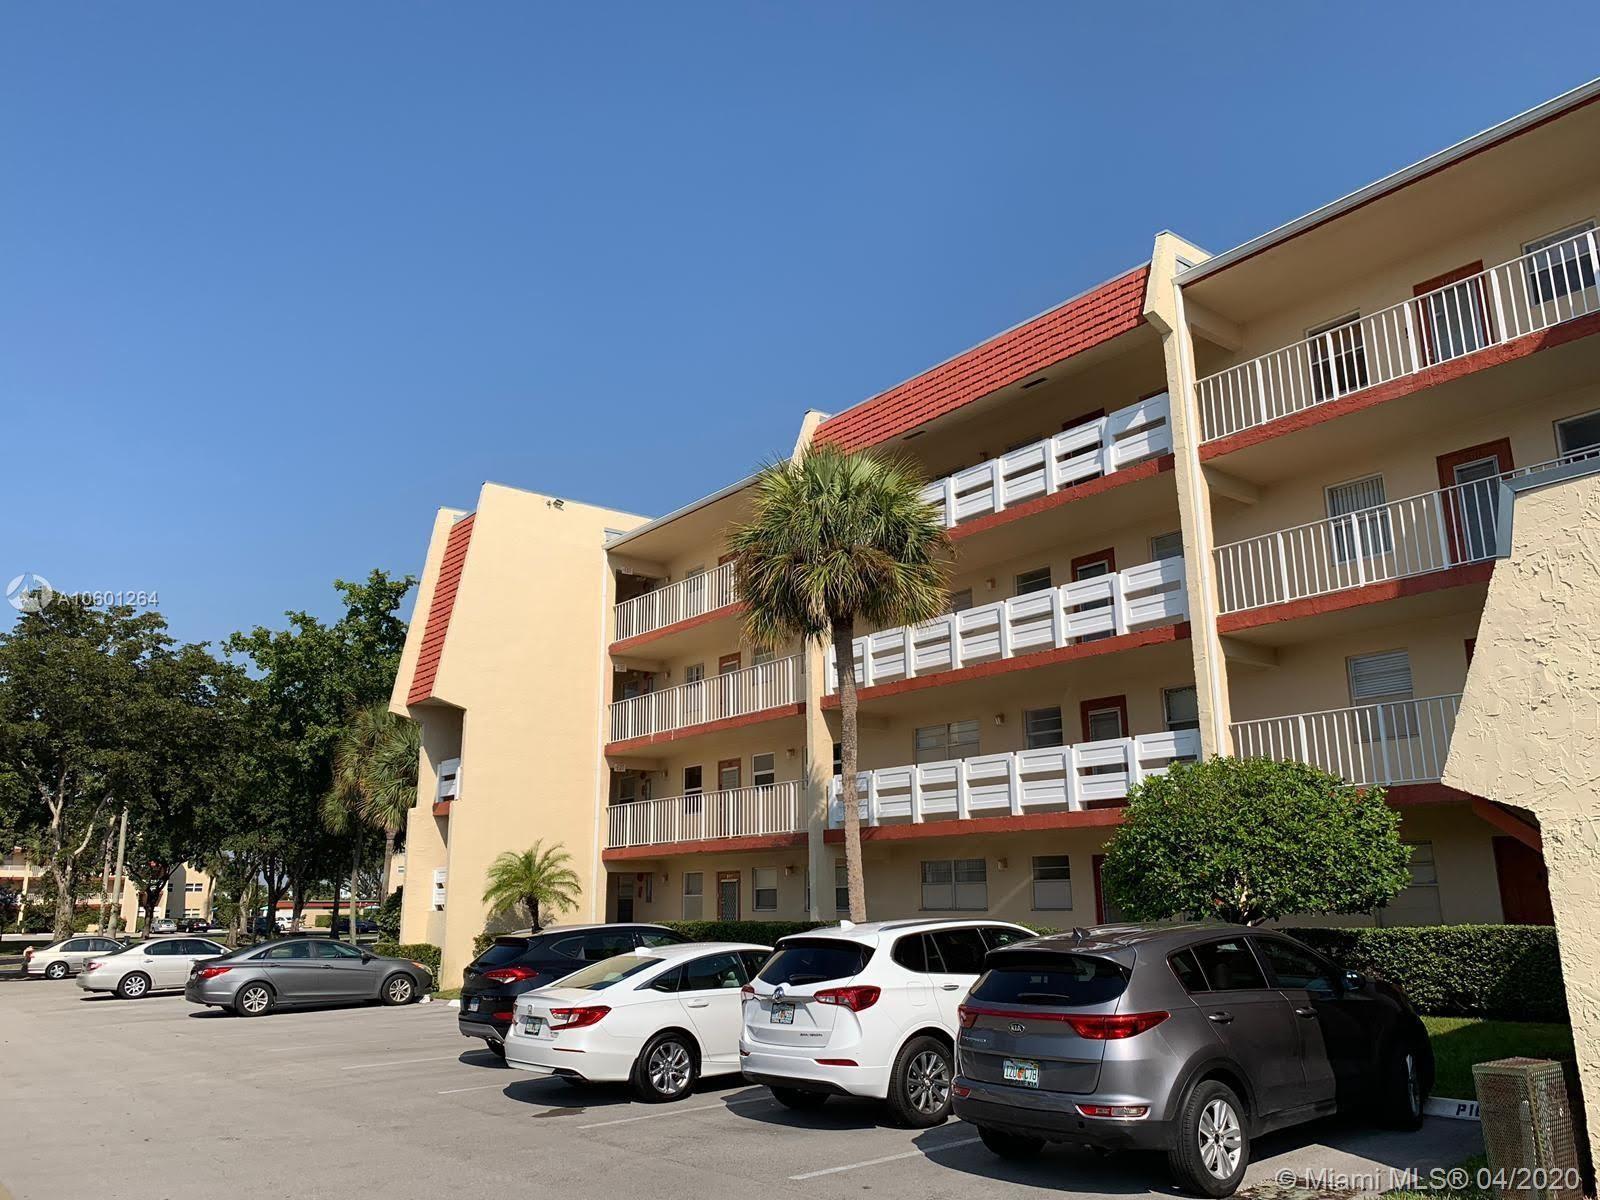 1020 country club drive #106, Margate, FL 33063 - MLS#: A10601264